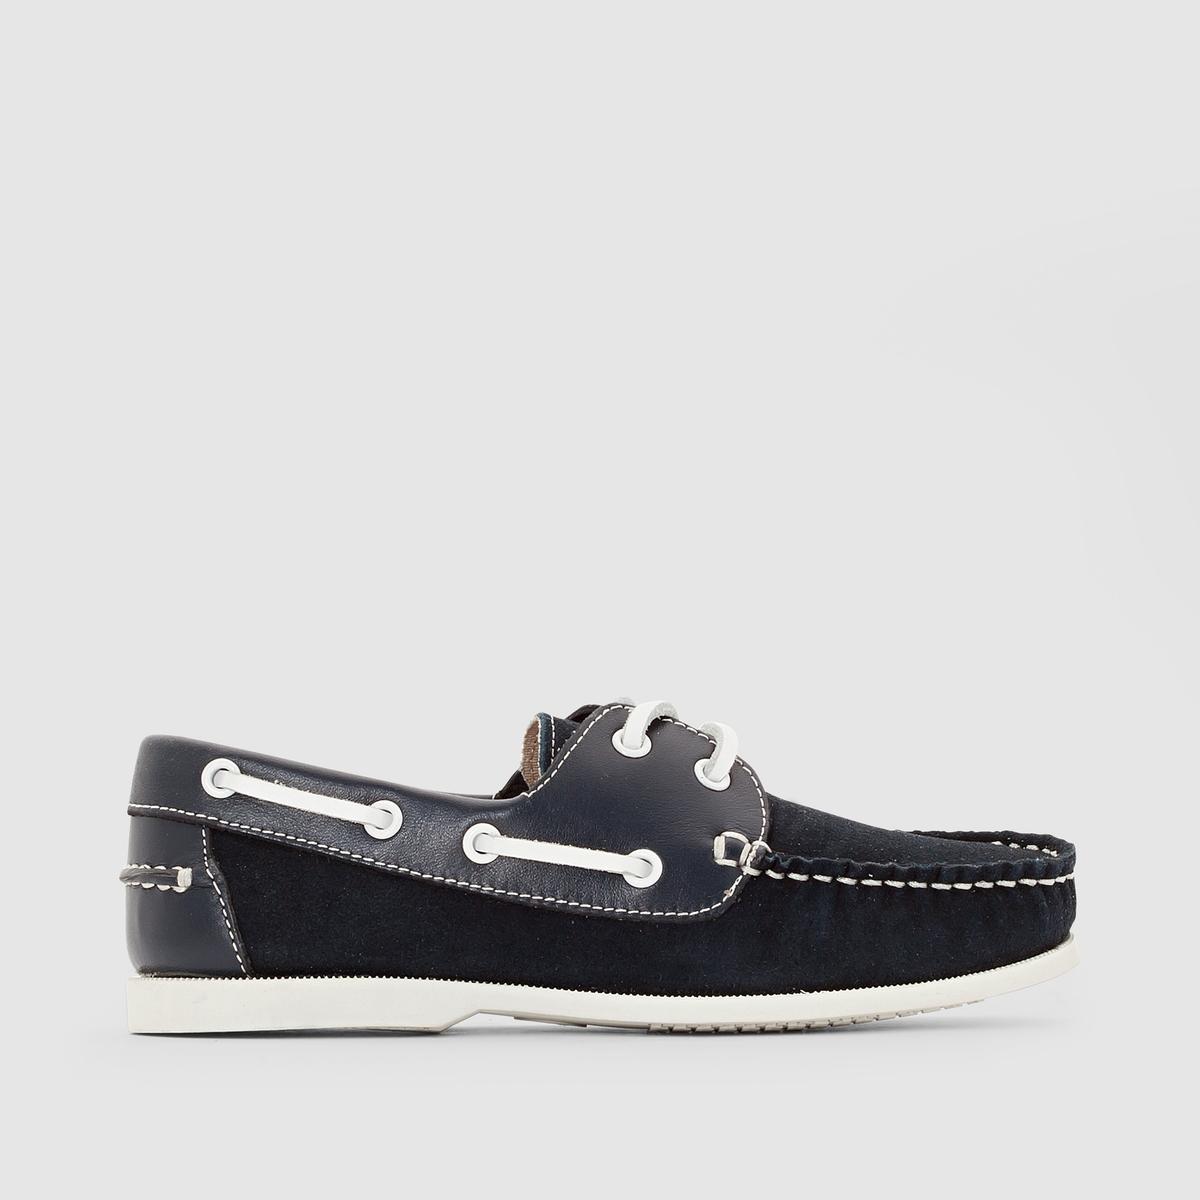 Туфли-лодочки из невыделанной яловичной кожи от La Redoute